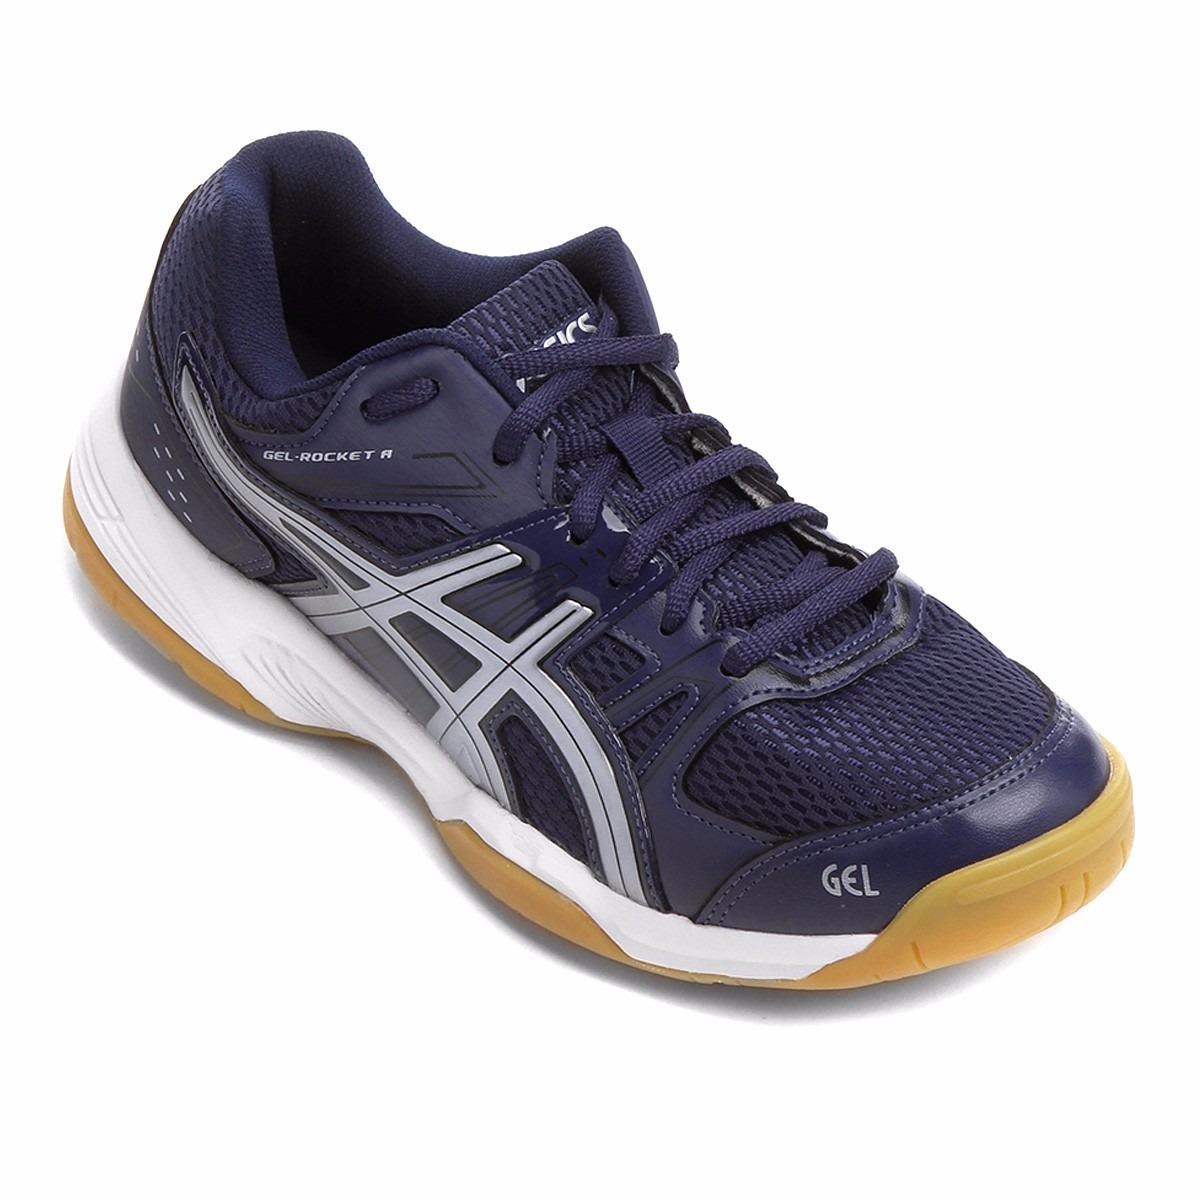 d92e875aab733 Tênis Asics Gel Rocket 7a - Futsal   Handebol   Voleibol - R  308